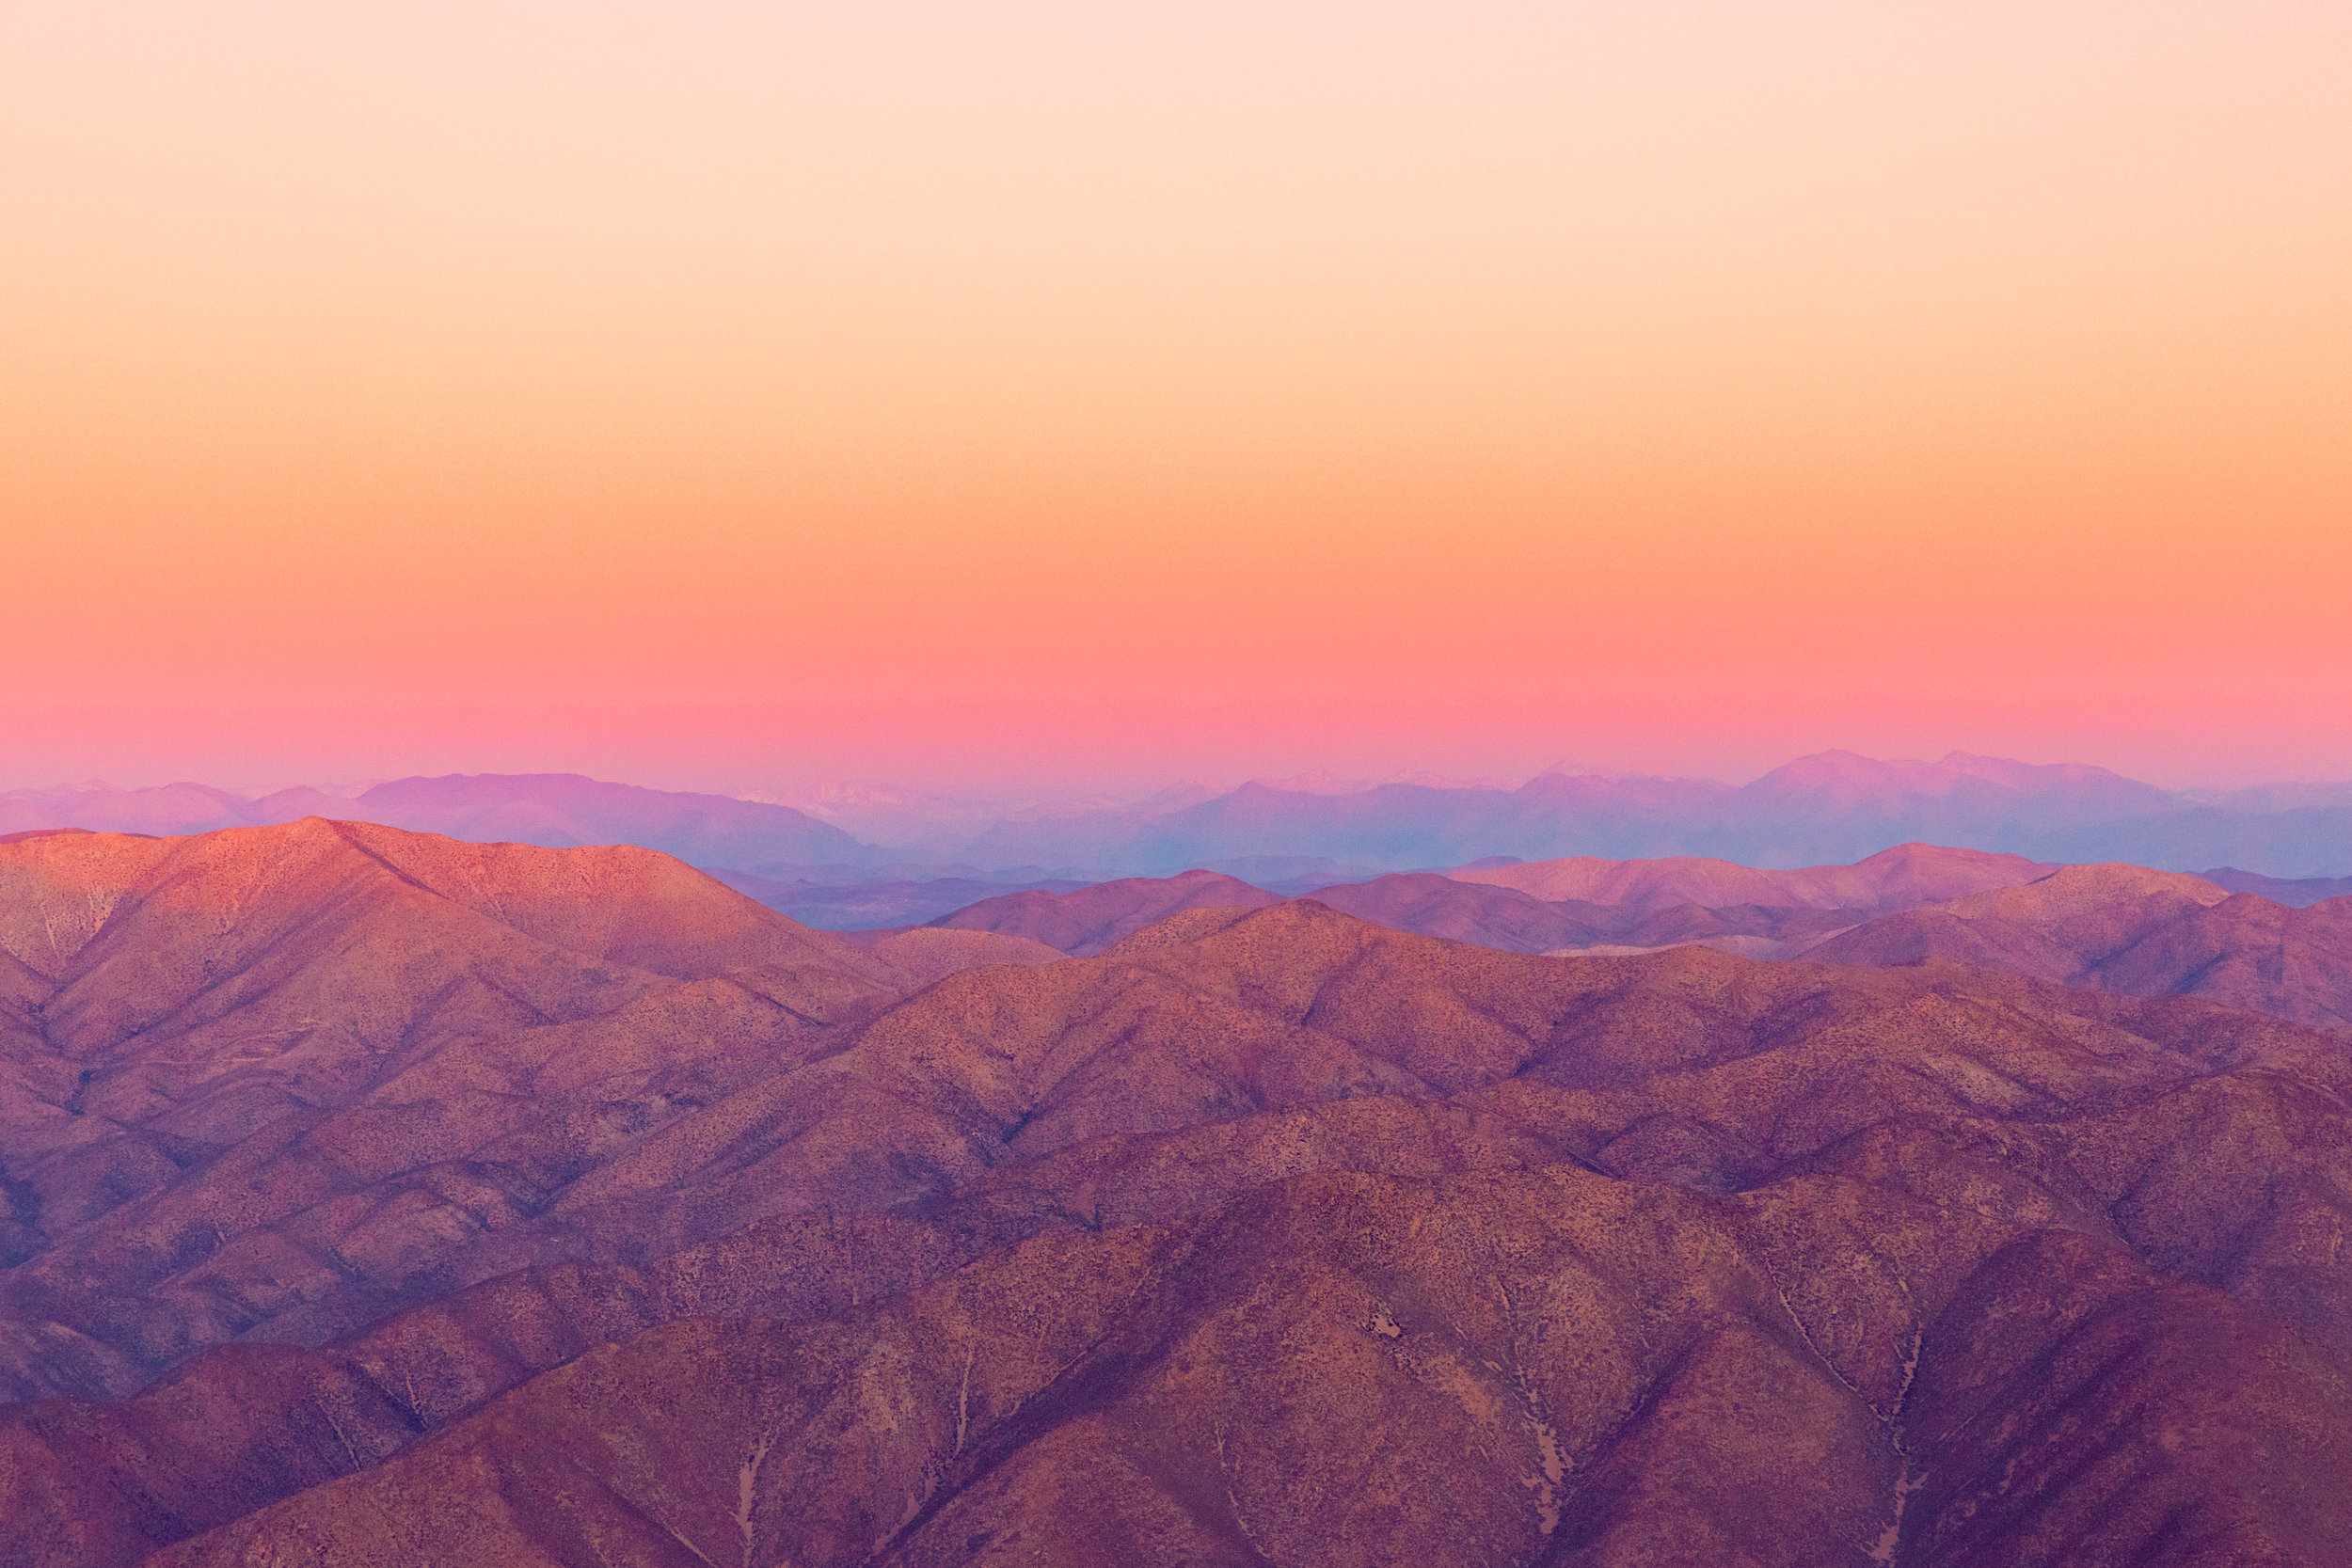 evanbdudley-Chile-Eclipse-19-1154.jpg